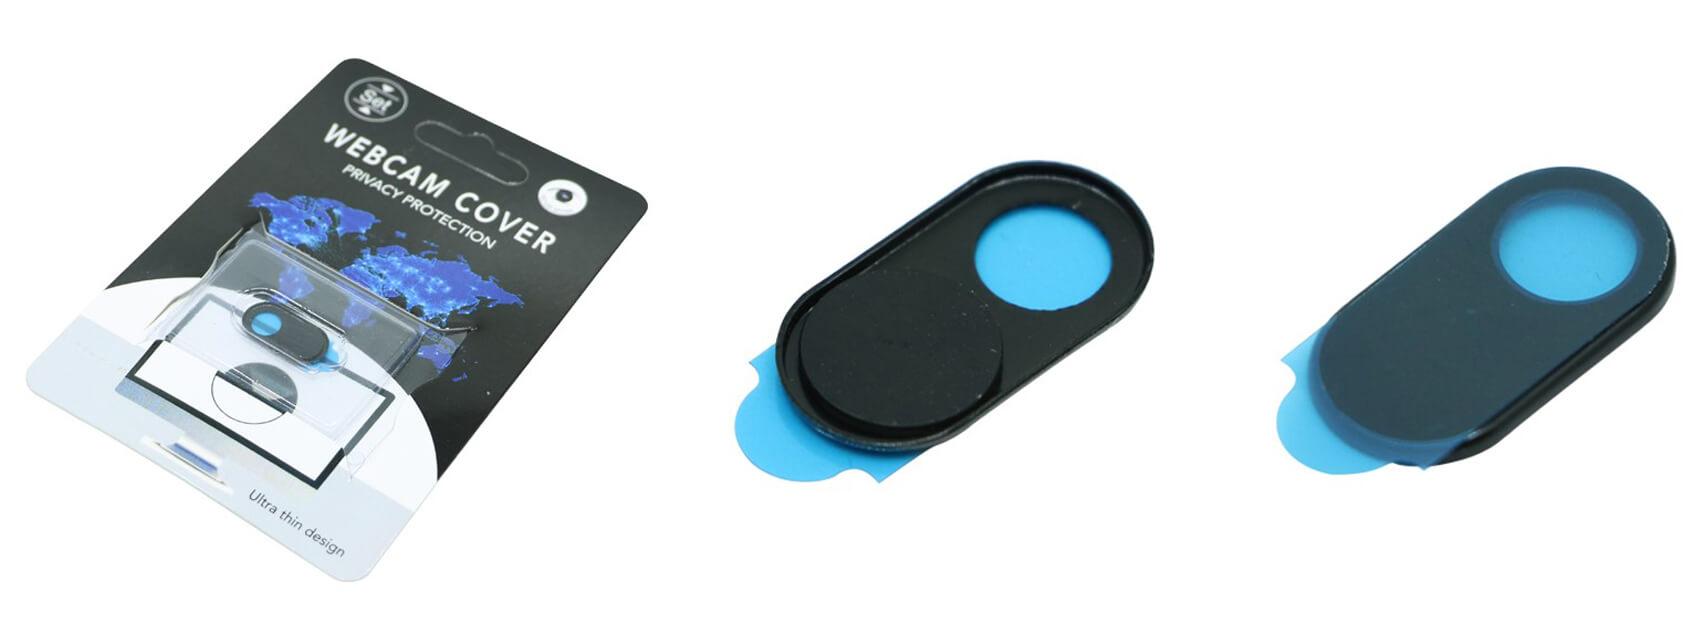 Buy Webcam Cover, Shutter Magnet Slider, Camera Cover For Devices